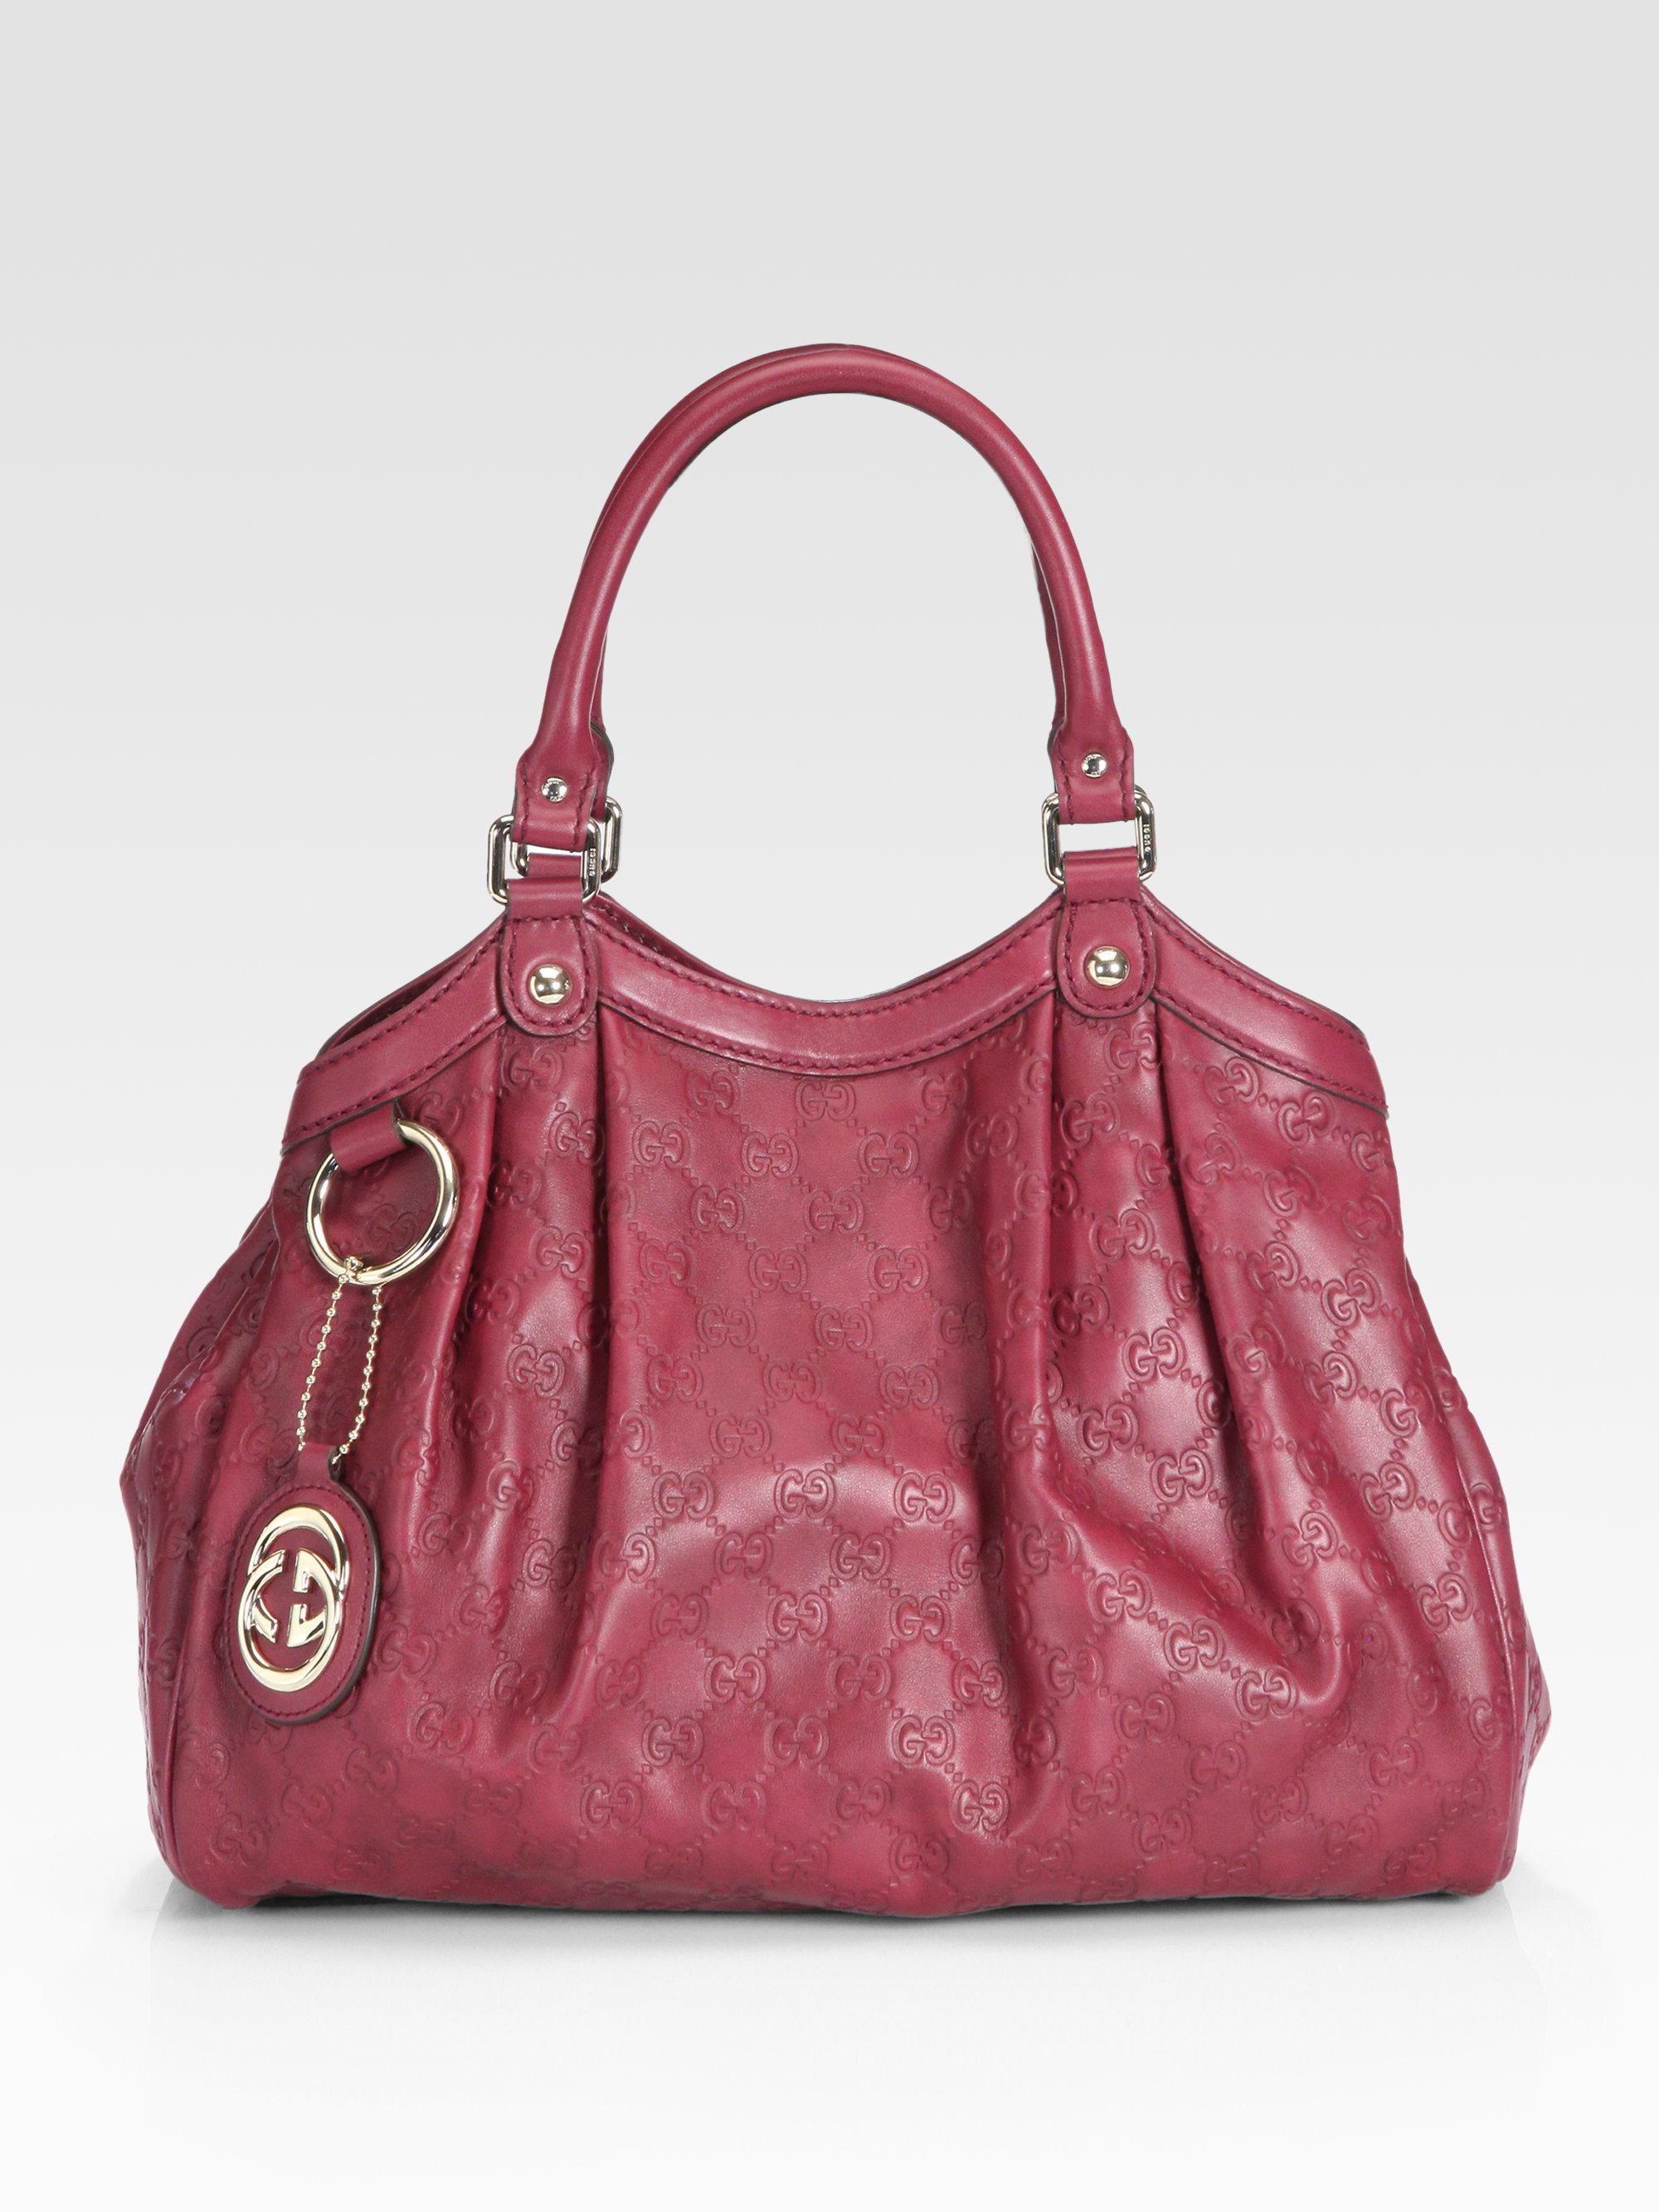 b23f38857b0a Lyst - Gucci Sukey Gg Medium Tote Bag in Red